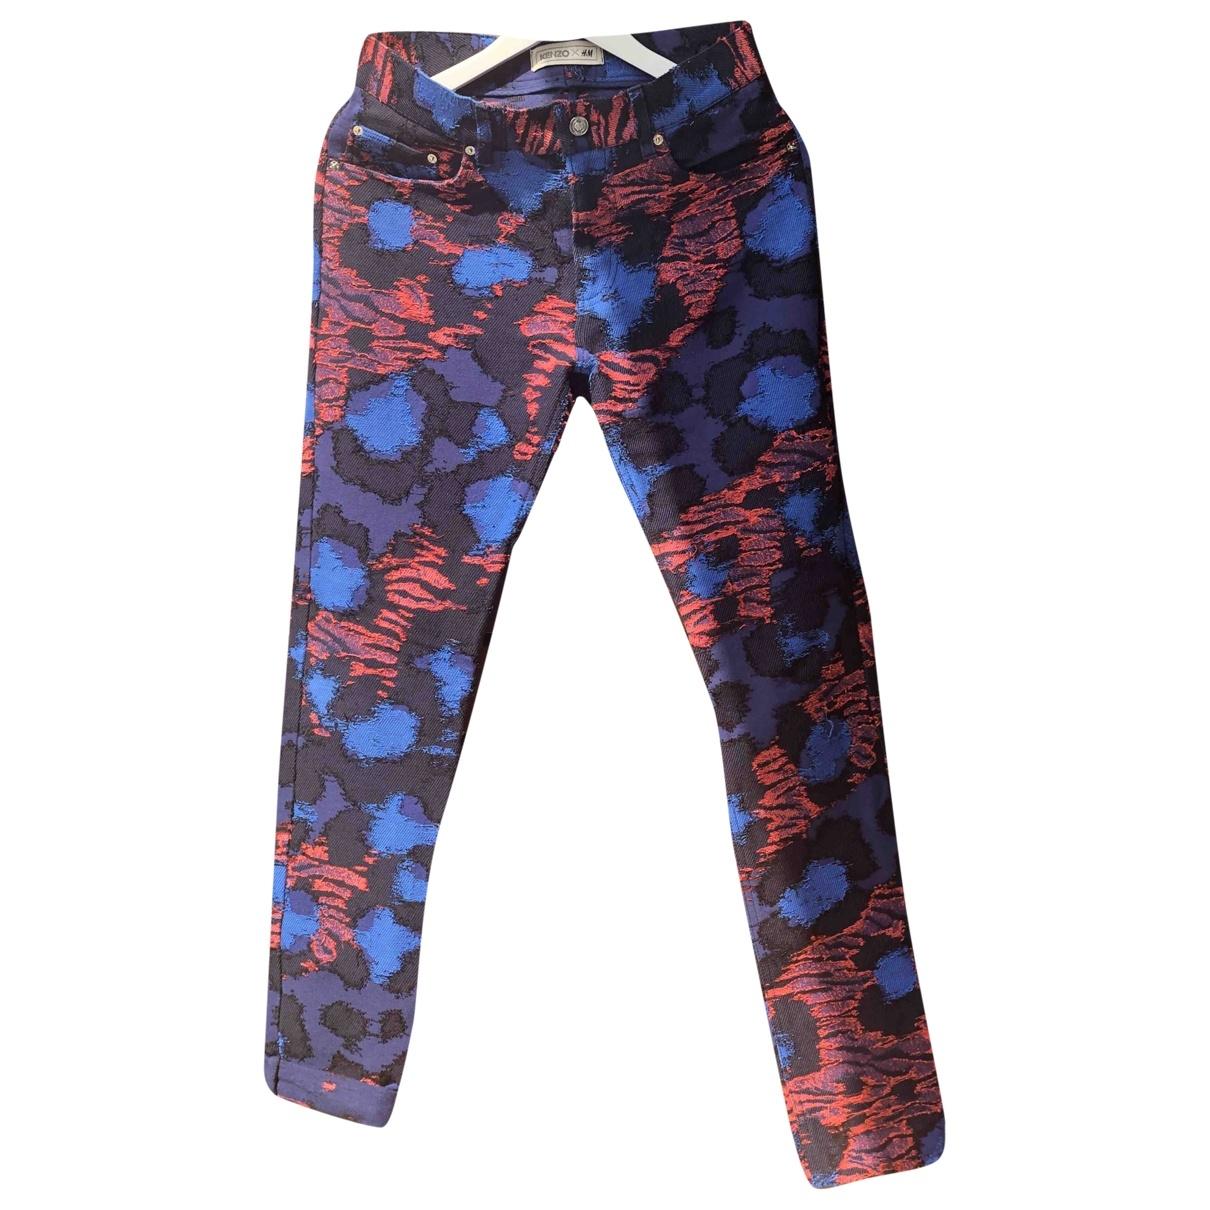 Kenzo X H&m \N Multicolour Cotton Trousers for Women M International